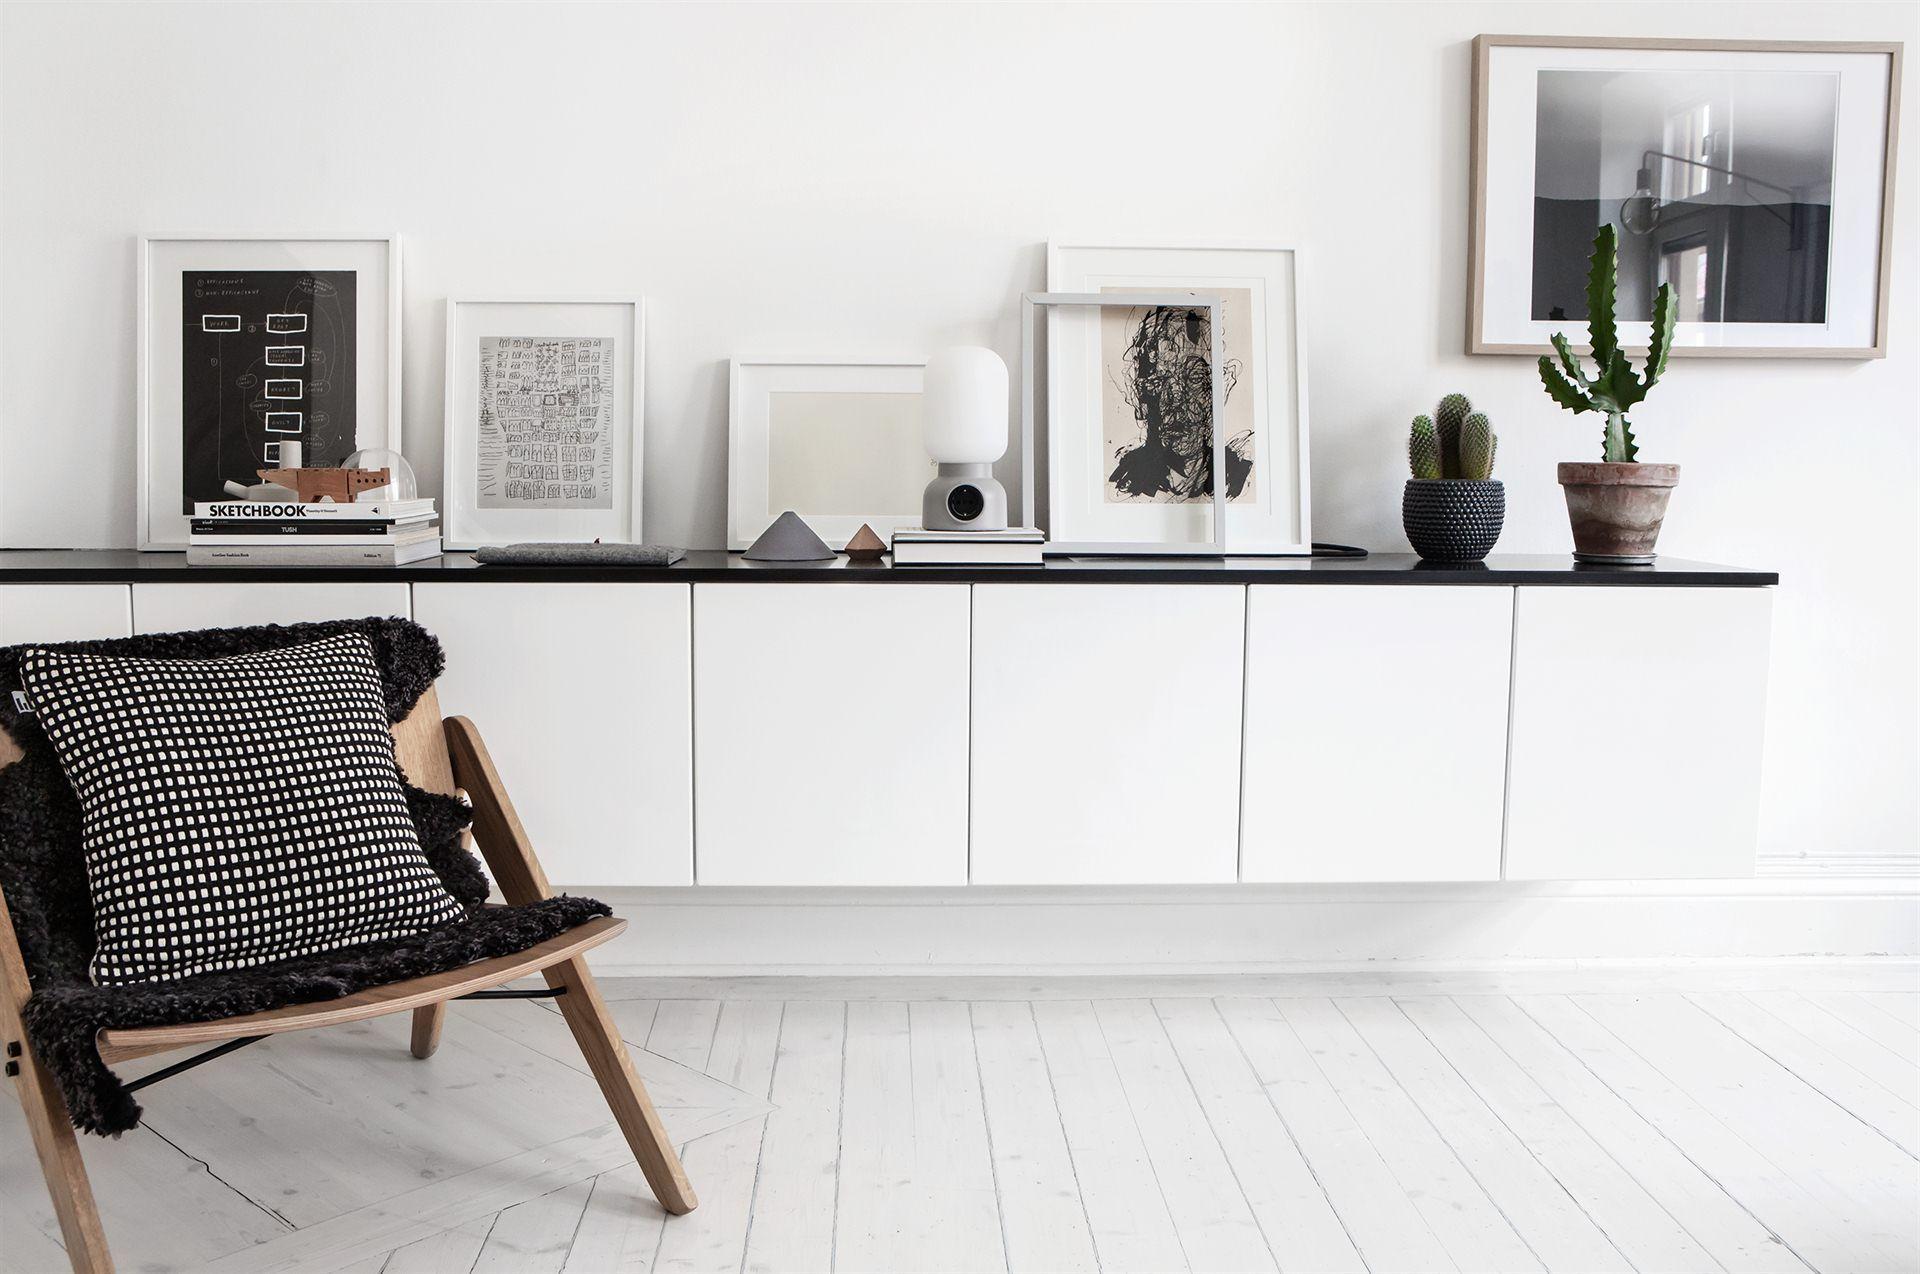 Bengt Ekehjelmsgatan 9, Södermalm - Mariatorget, Stockholm | Fantastic Frank